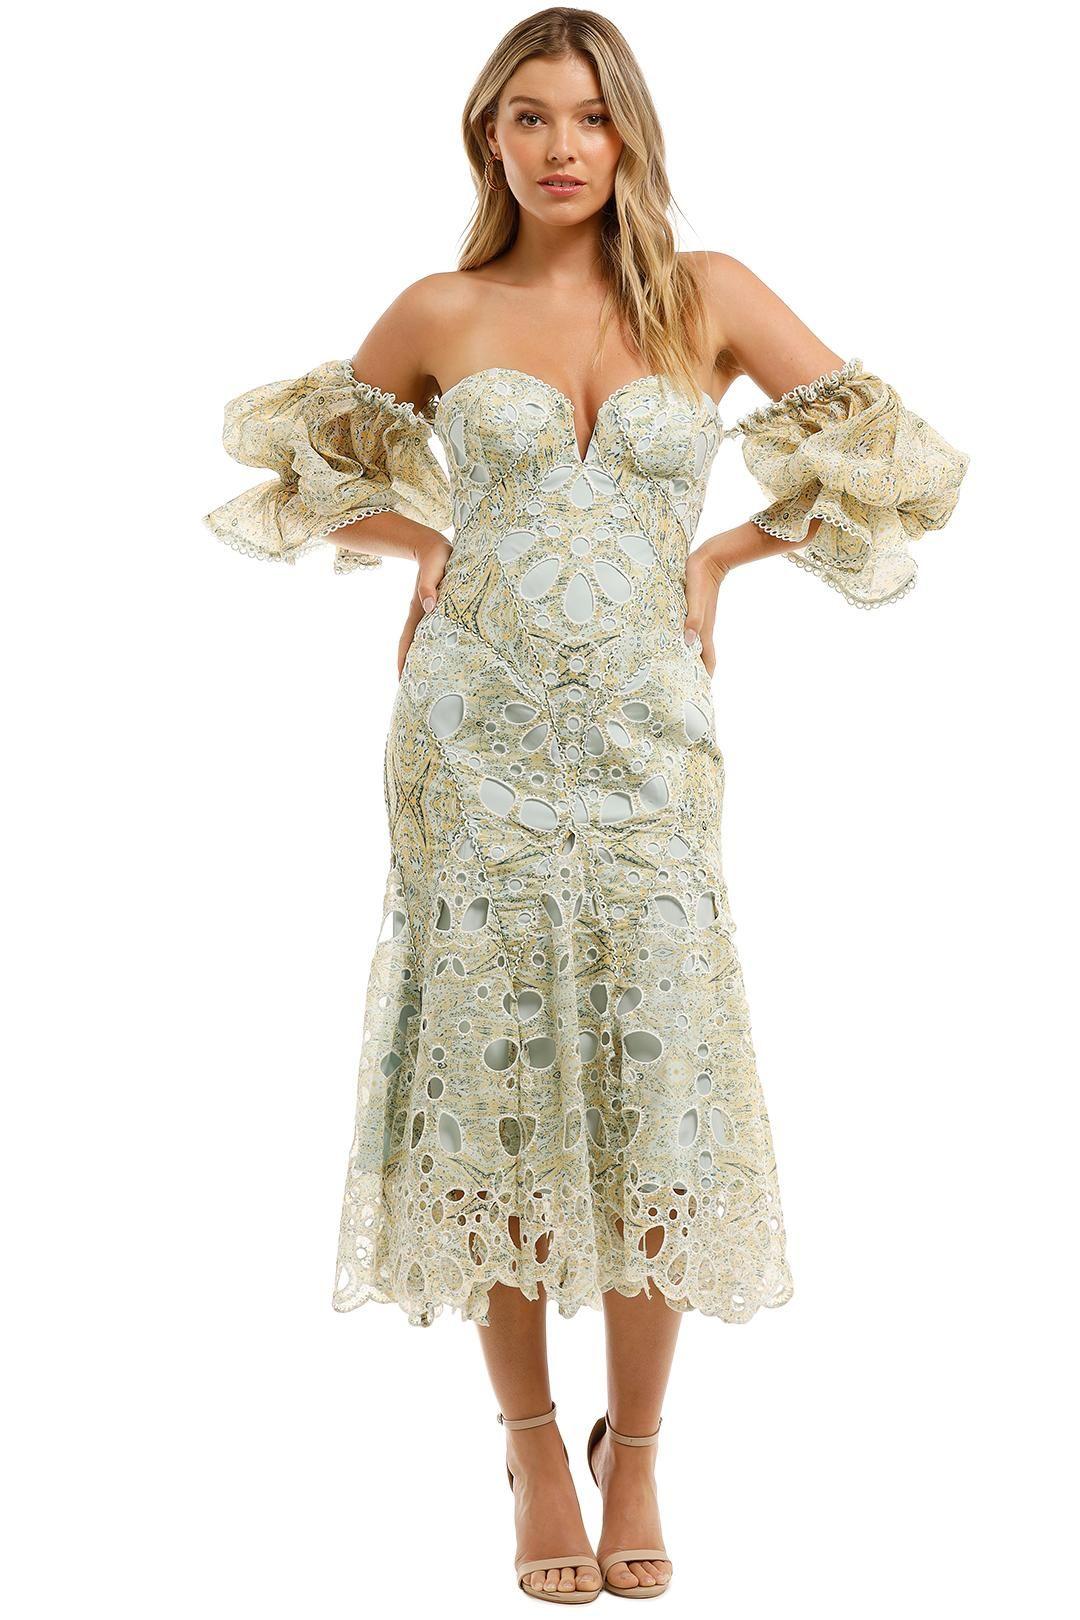 Acler Holland Dress Midi